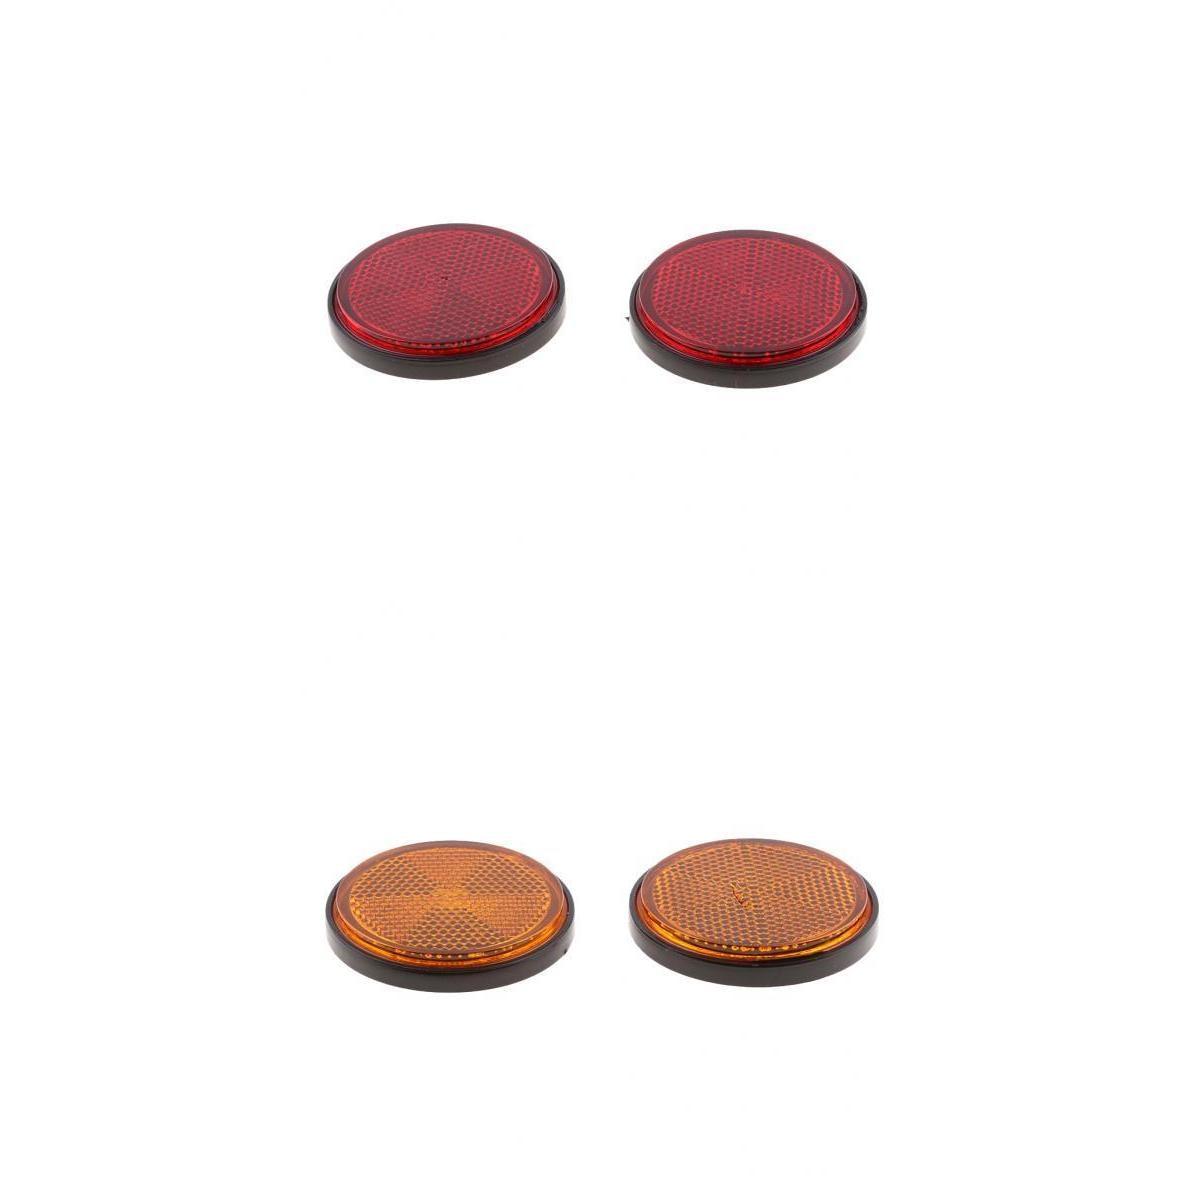 2 Pair  Red/Orange Universal Plastic Round Reflectors For Motorcycles Motor ATV Bikes Dirt Bike Motorcycle Accessories